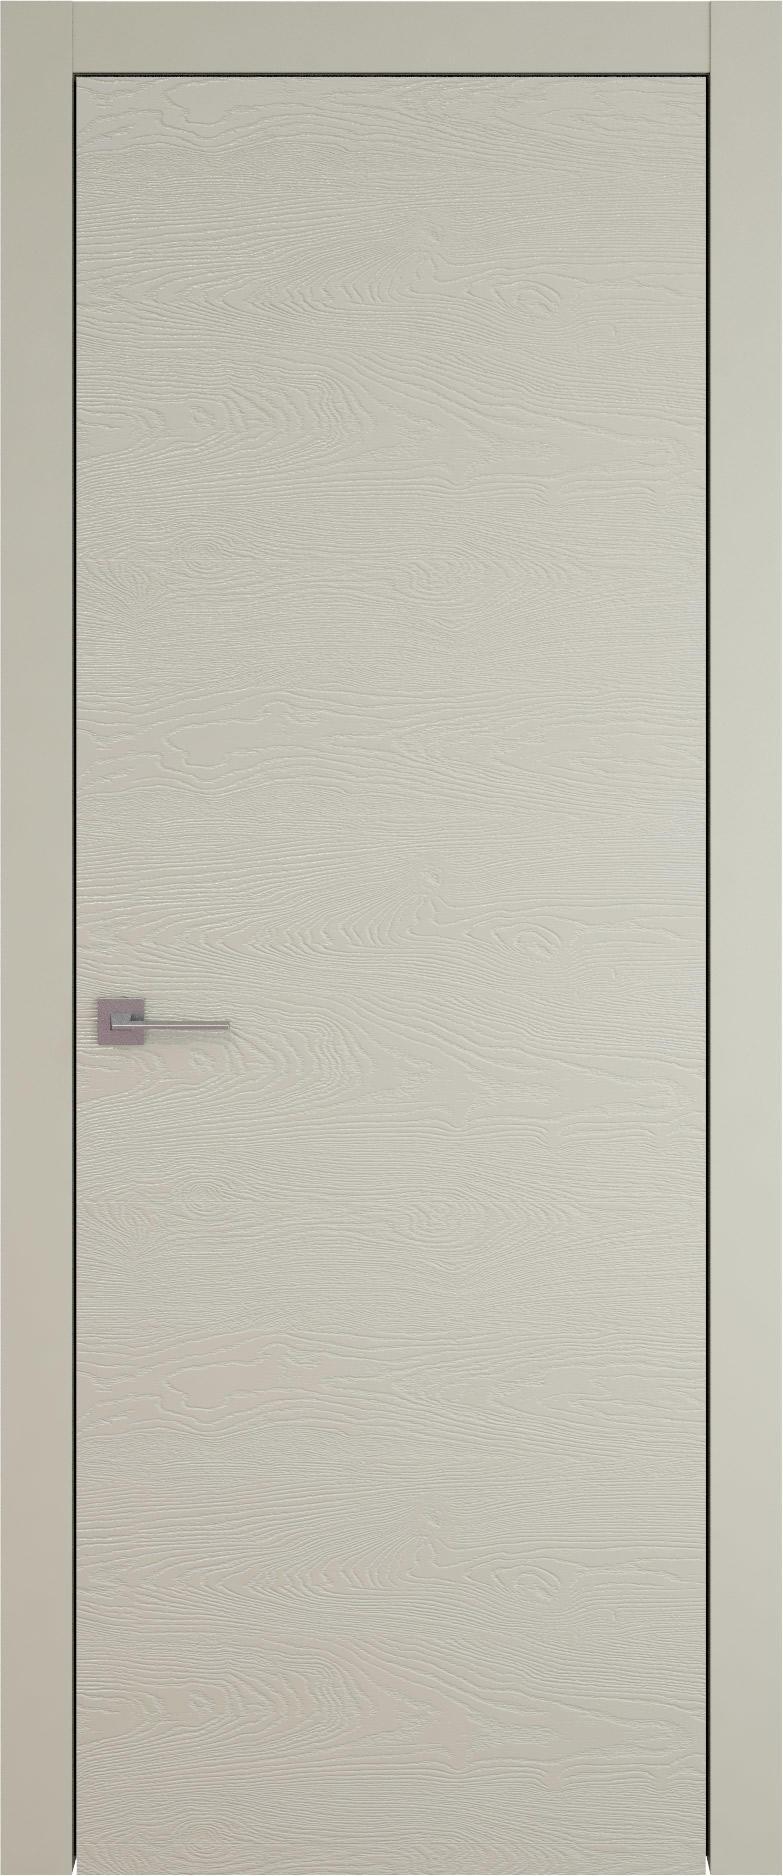 Tivoli А-5 цвет - Серо-оливковая эмаль по шпону (RAL 7032) Без стекла (ДГ)